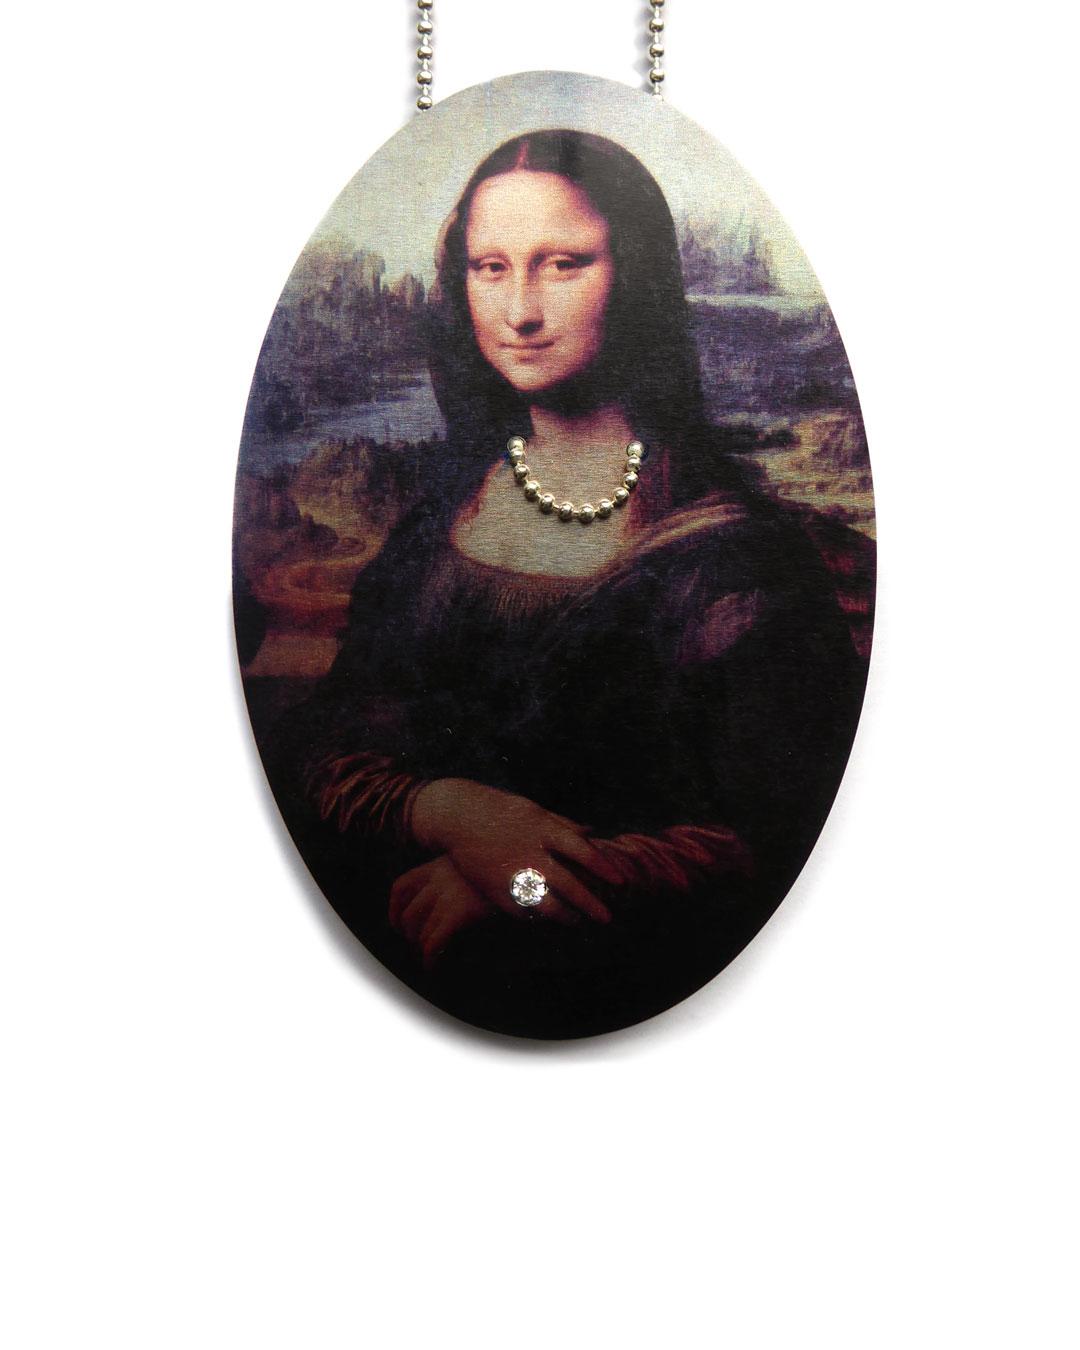 Herman Hermsen, Mona Lisa Chained, 2015, necklace; print on aluminium, wood, silver, zirconia, 320 x 60 x 10 mm, €600